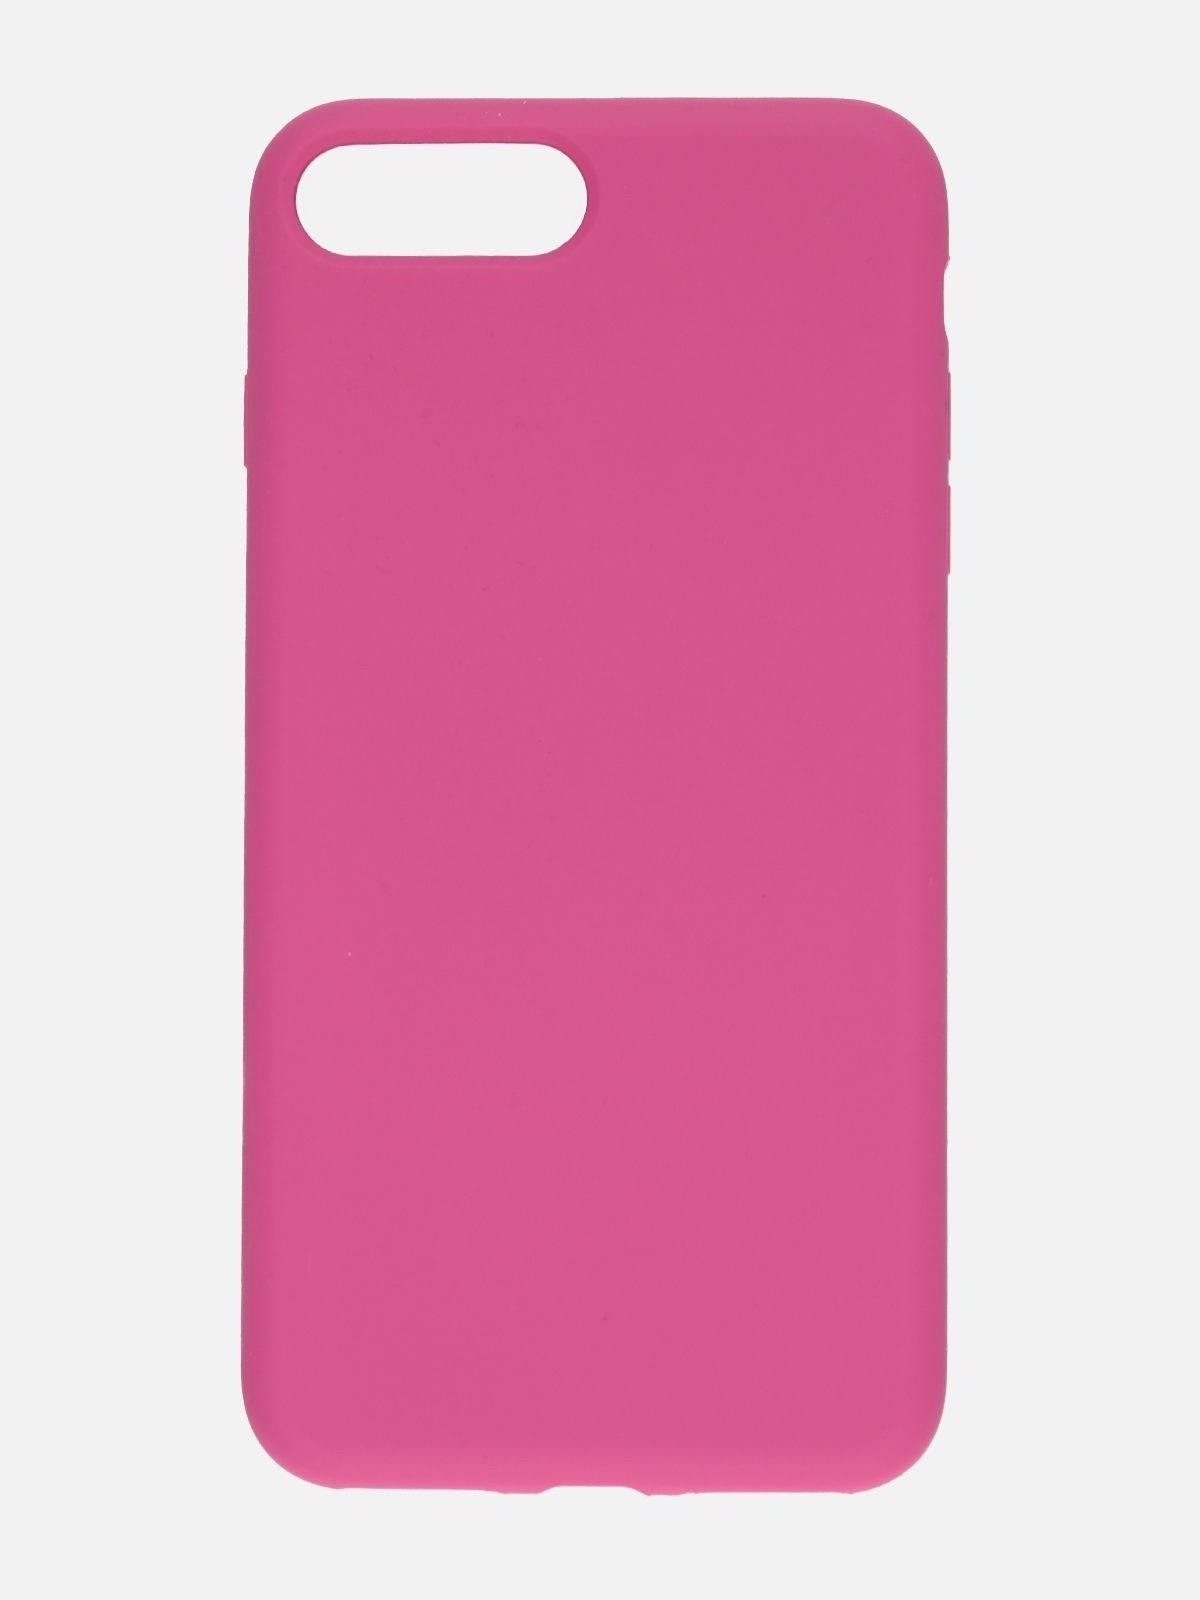 Siipro Custodia in silicone iphone 7/8 Plus -FUXIA: Tech Accessories